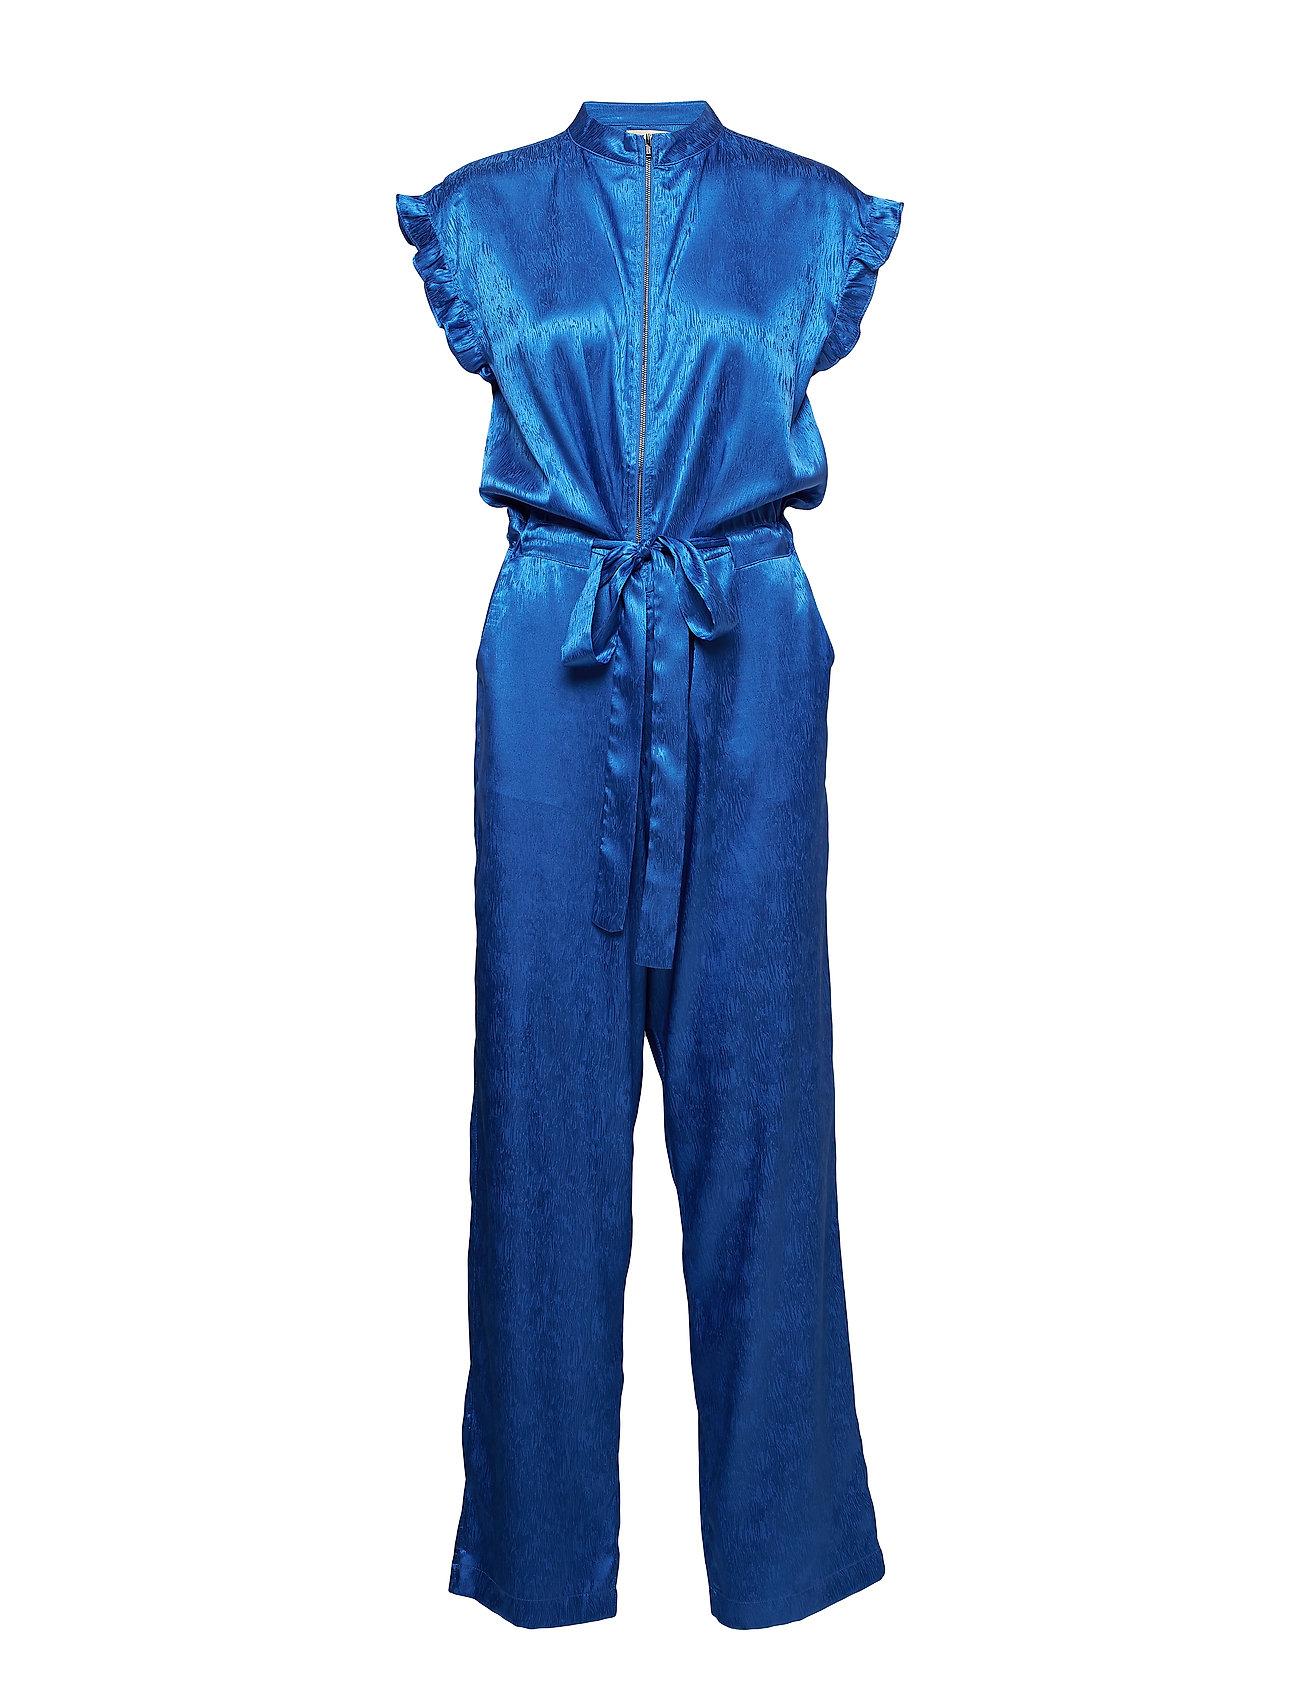 Lollys Laundry Caro Jumpsuit - BLUE